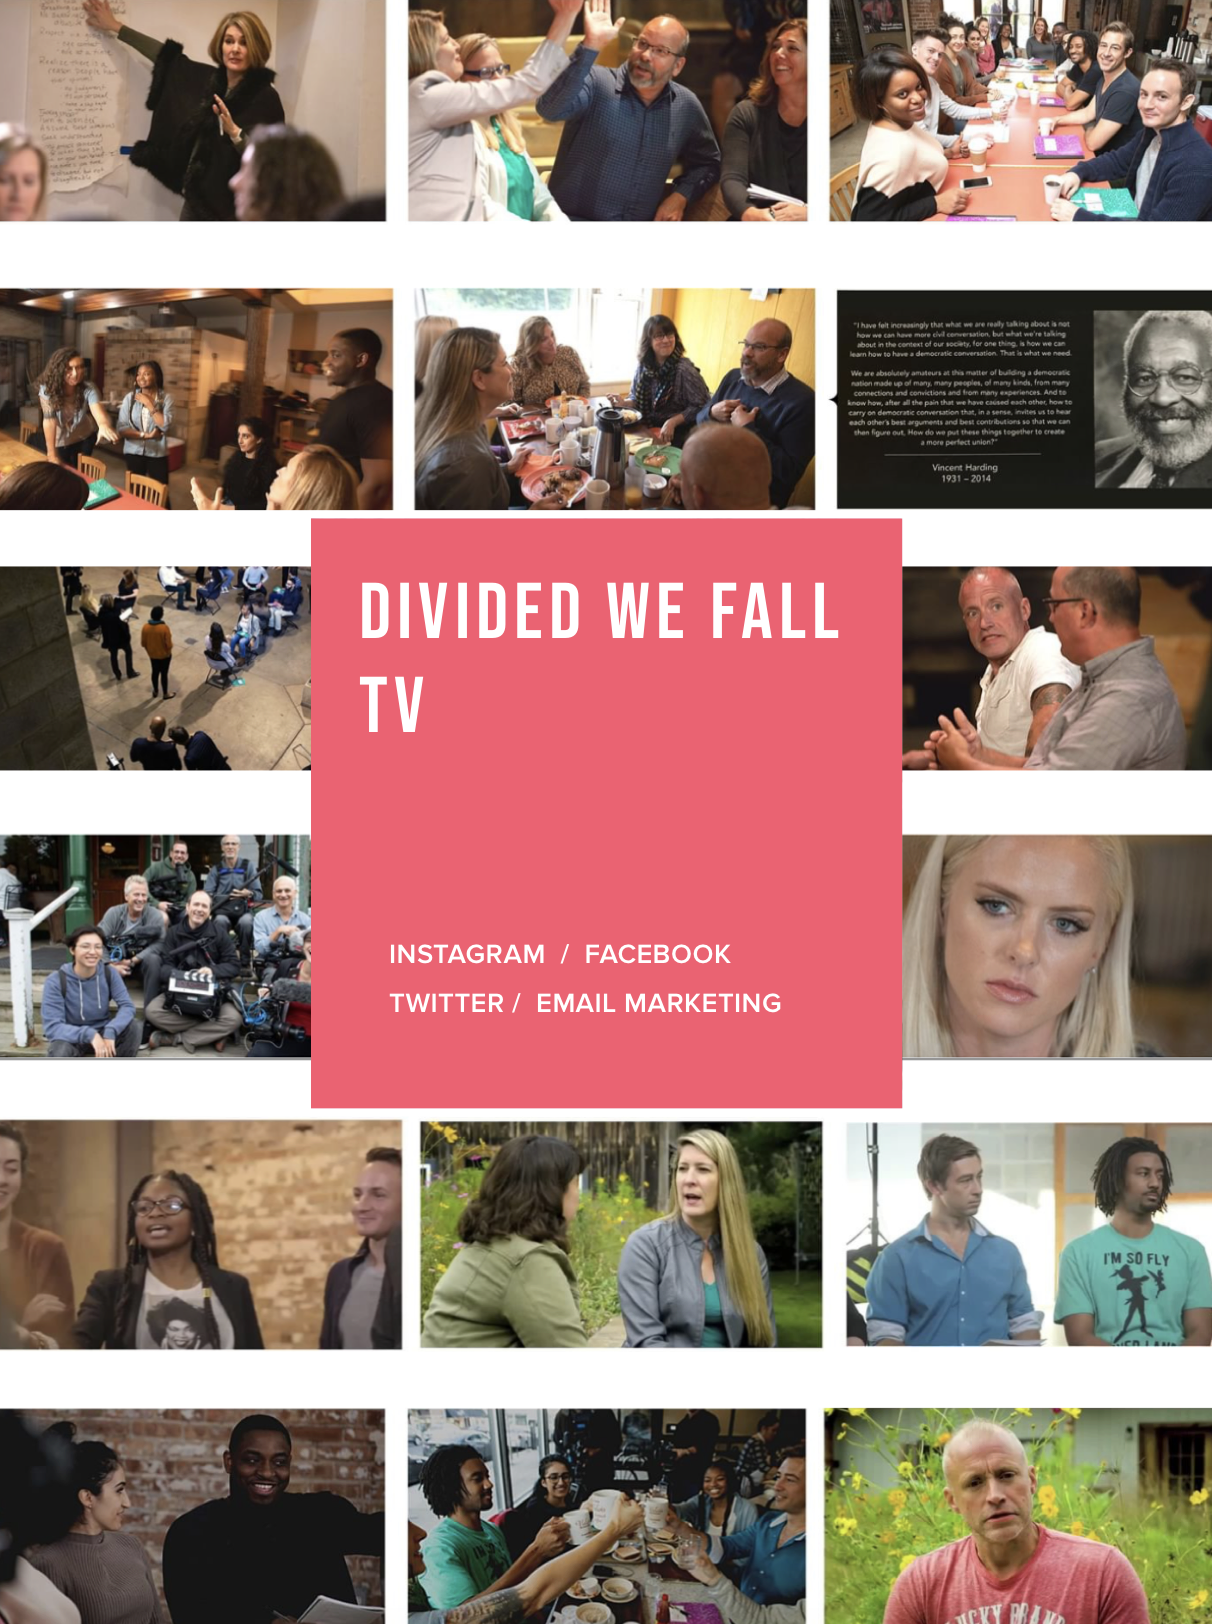 Divided We Fall TV - Instagram: @dividedwefalltvFacebook: Divided we Fall TVTwitter: @dividedwefalltv